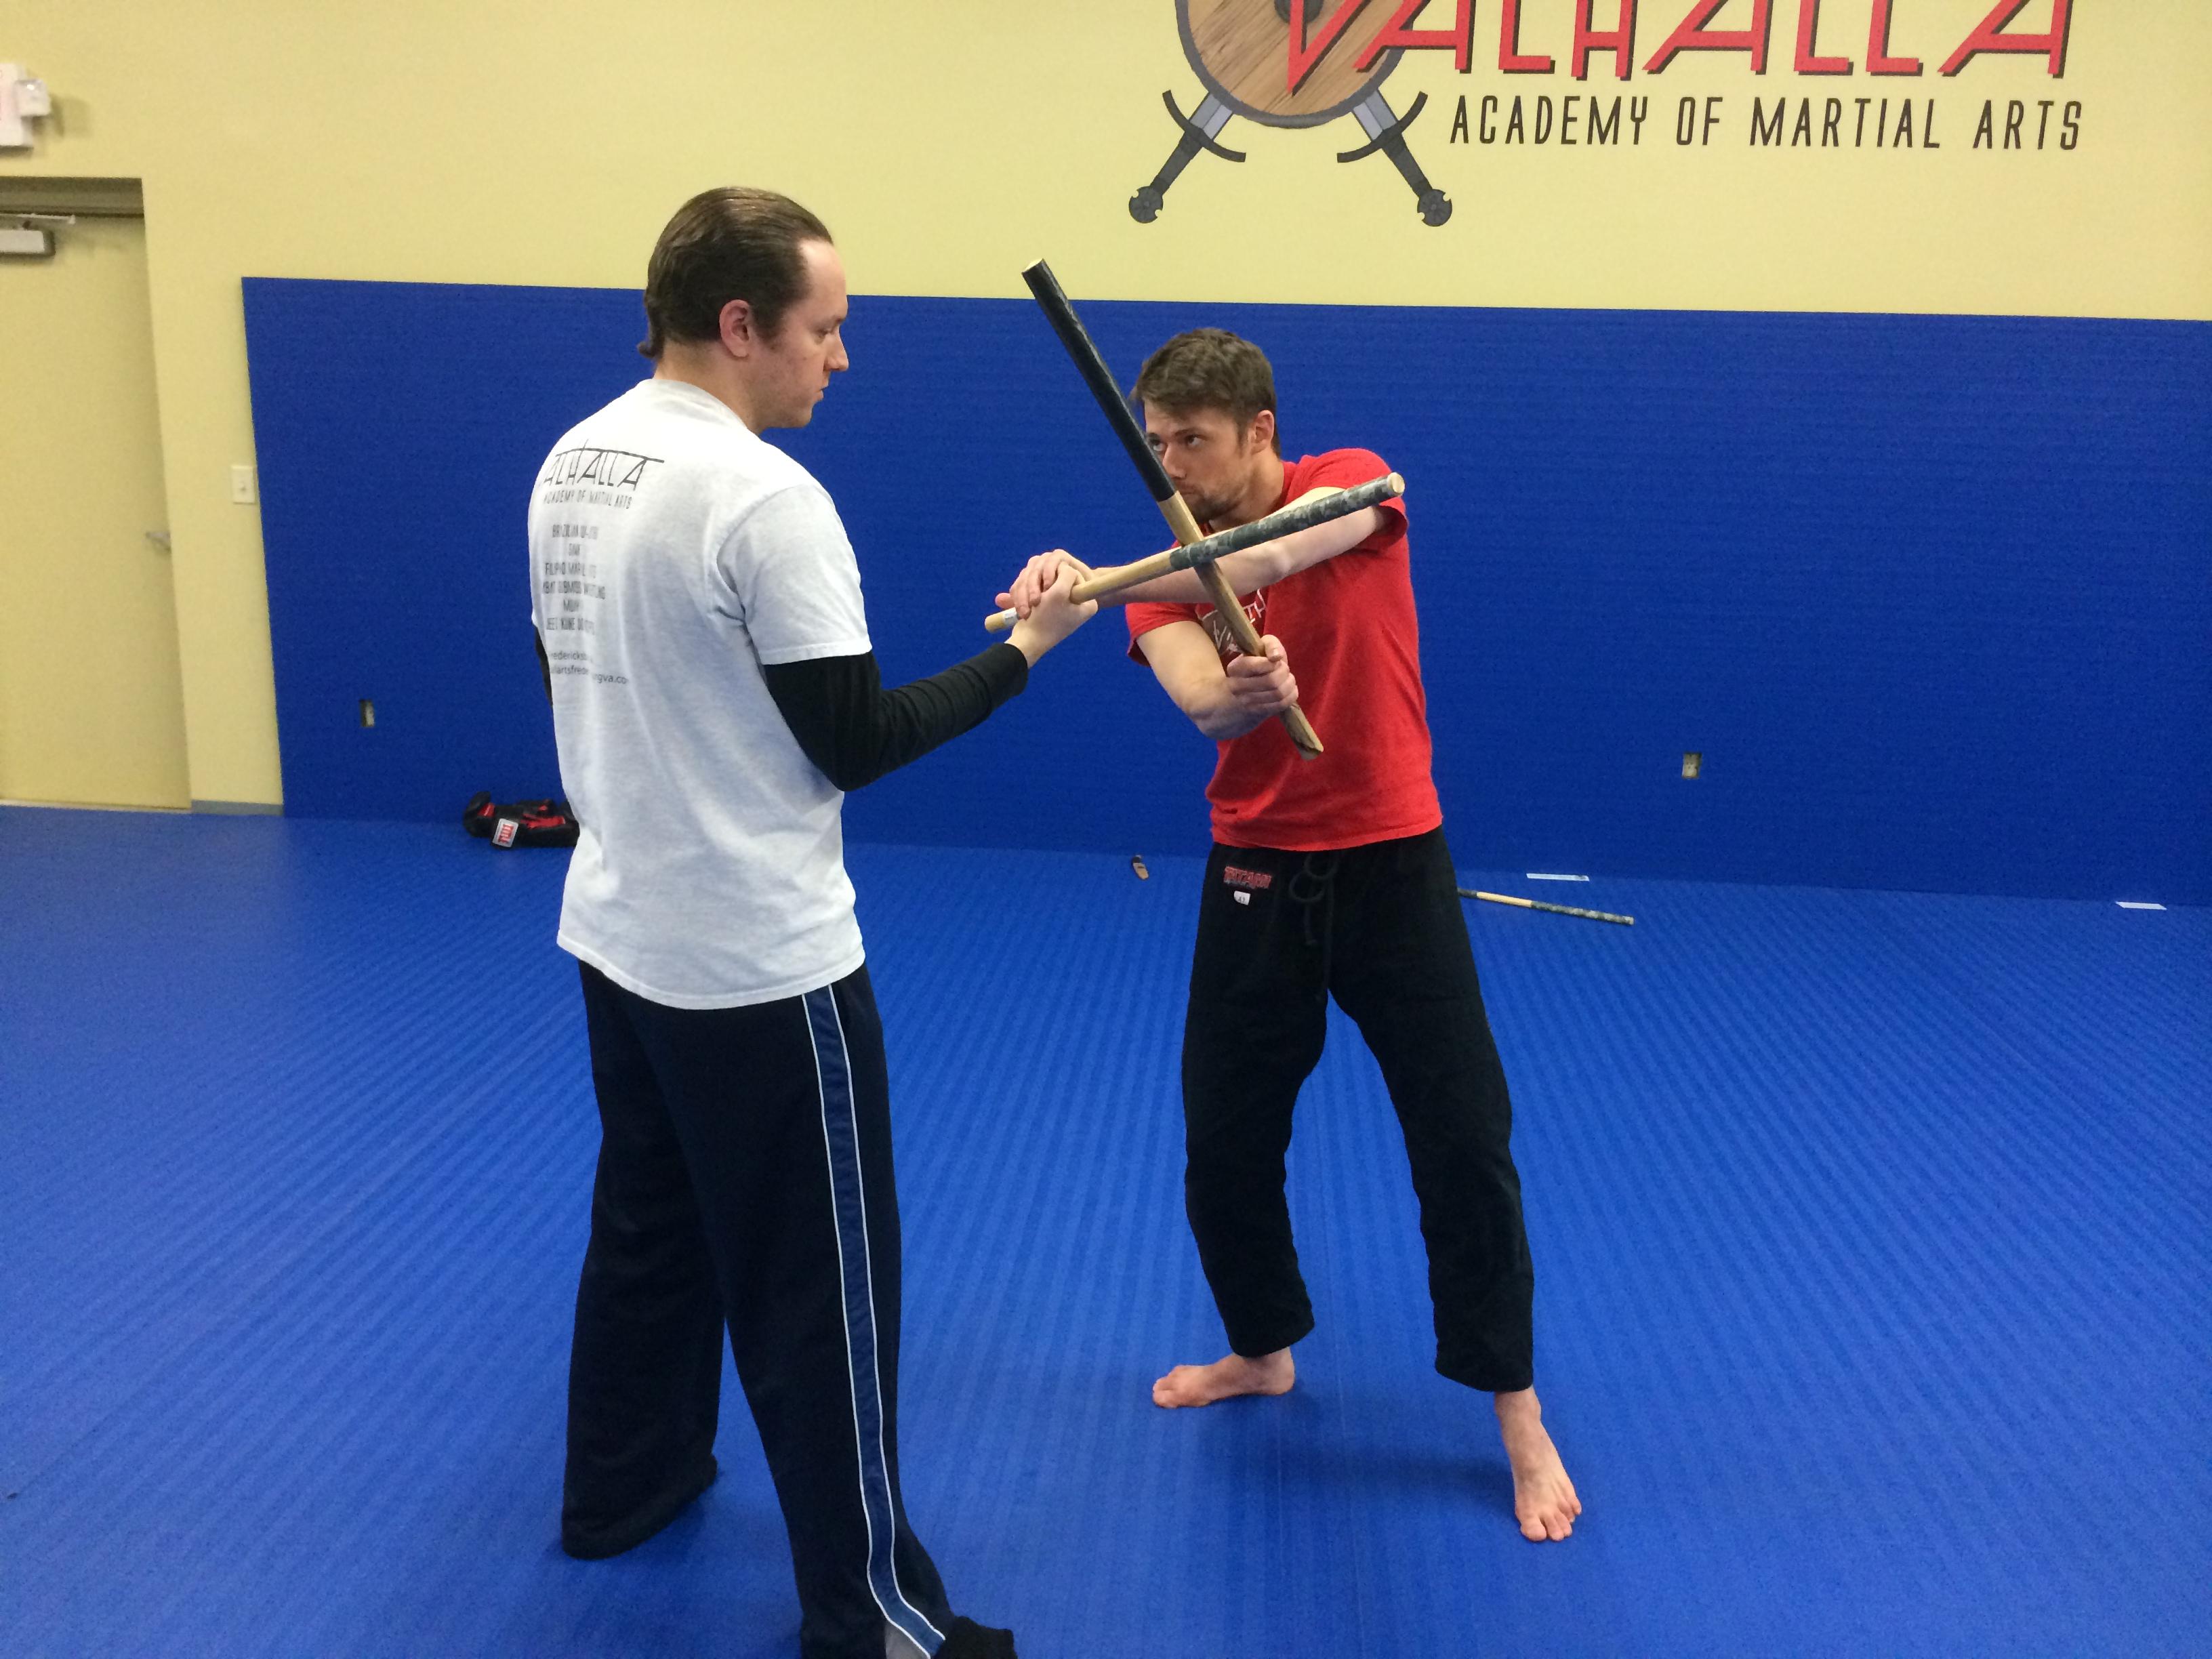 Valhalla Academy of Martial Arts image 2